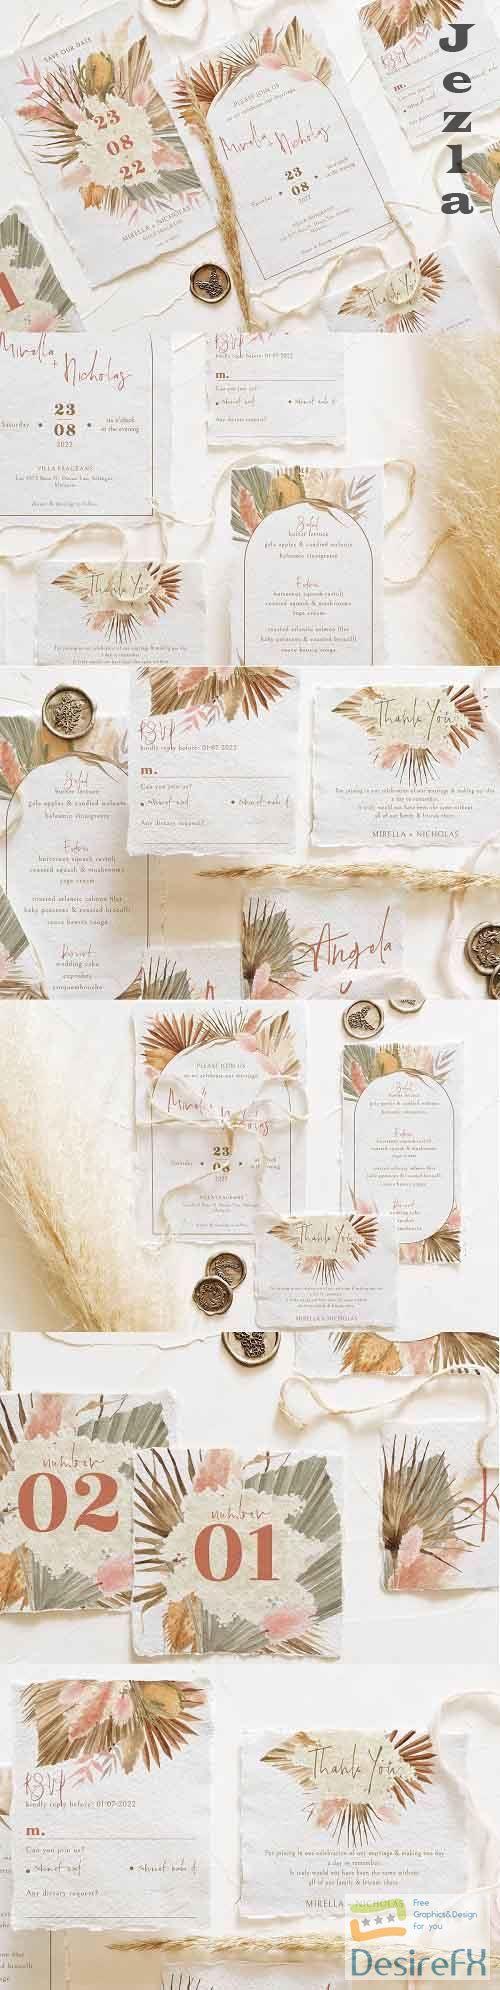 Bohemian Dried Foliage Wedding Suite - 5151657